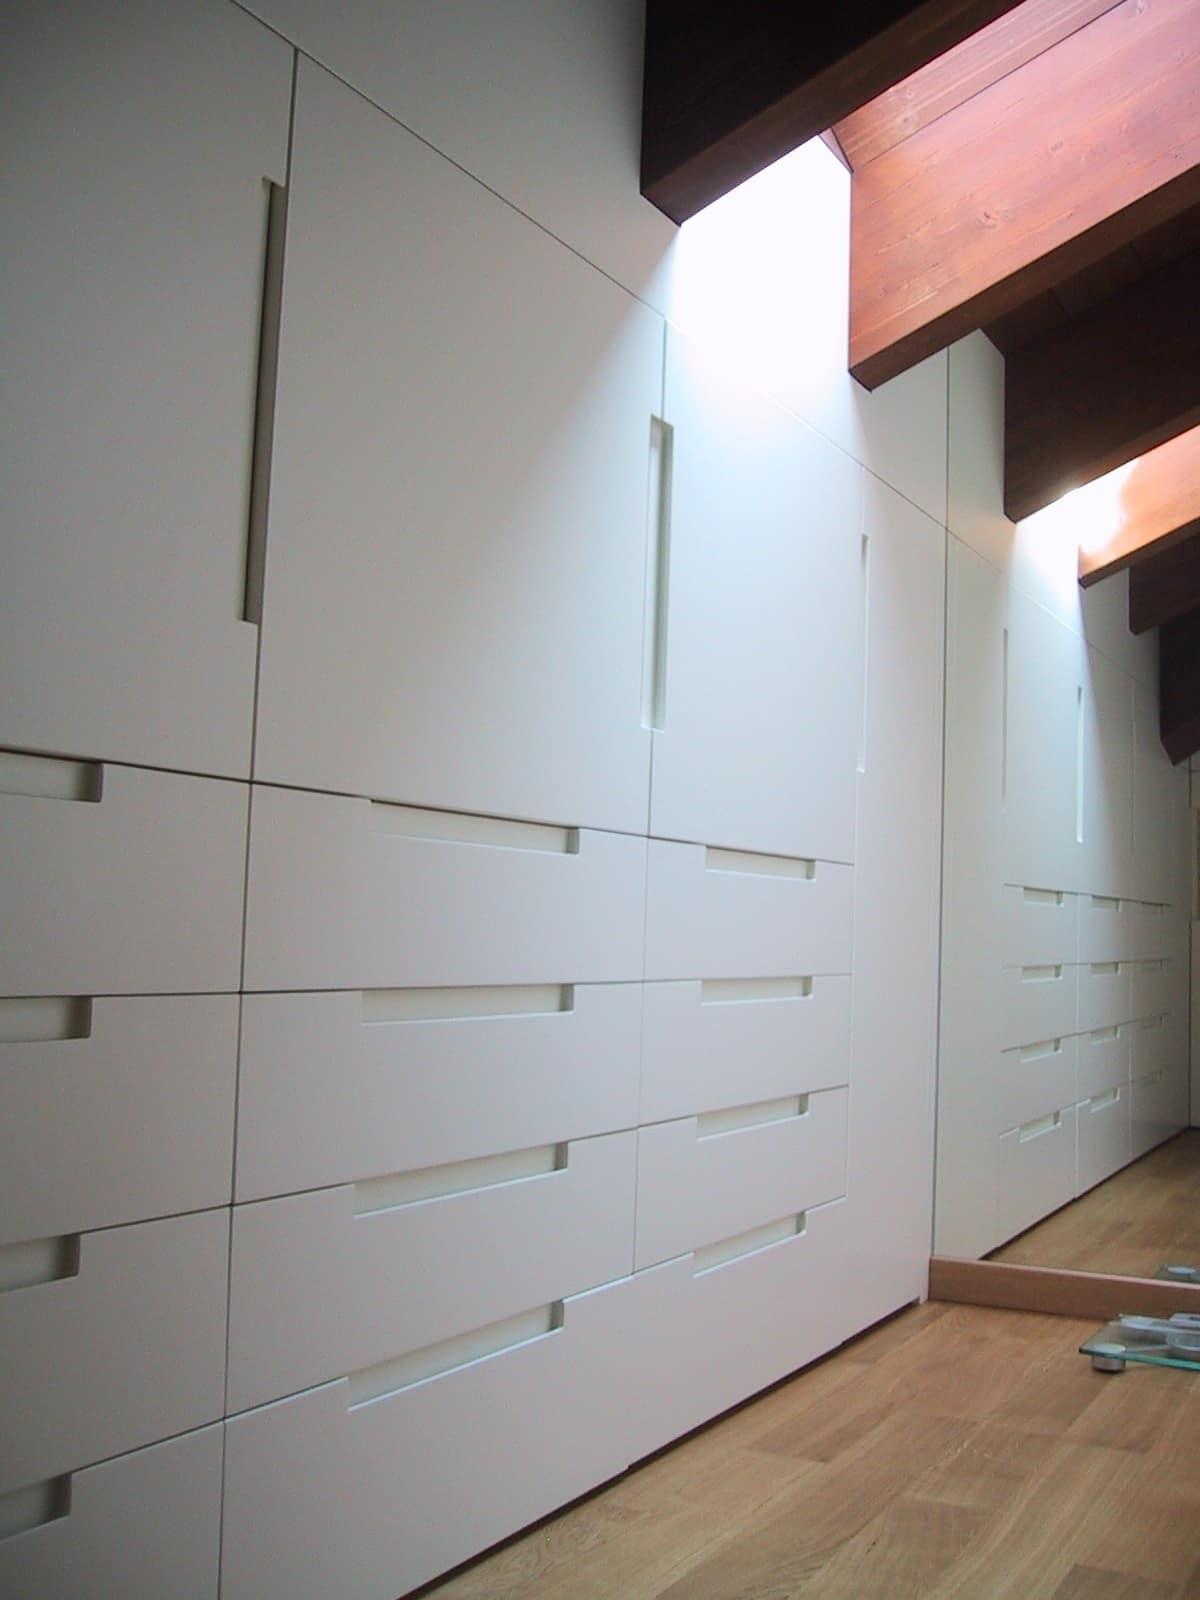 Armadio in legno laccato bianco per mansarda idfdesign for Armadio mansarda ikea